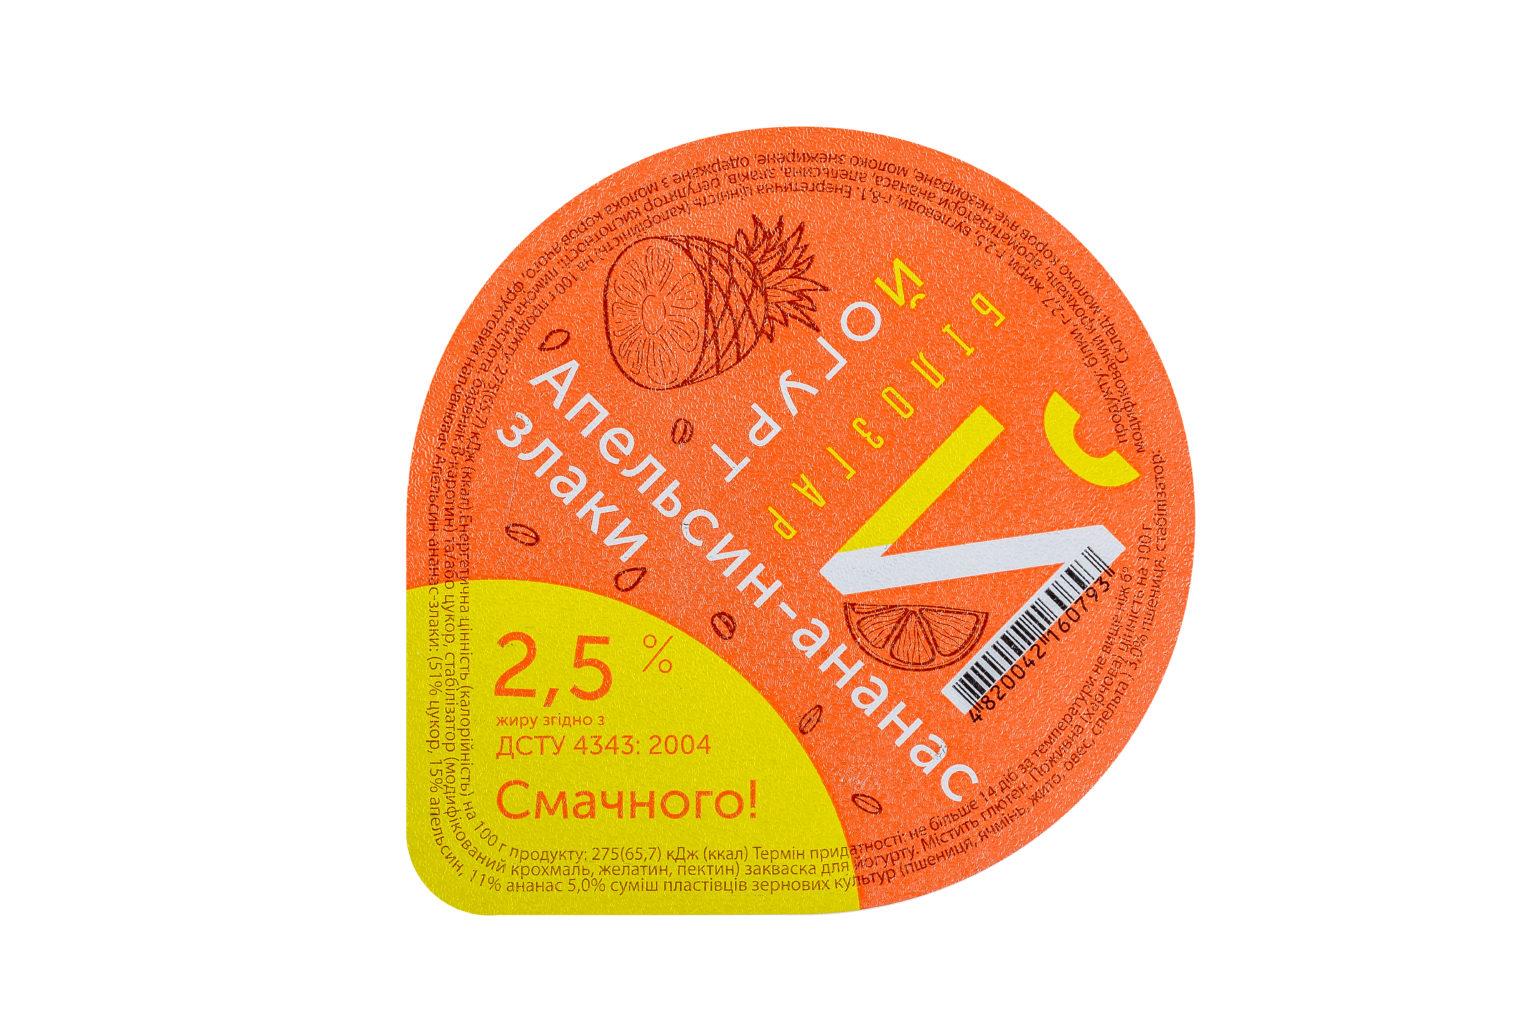 ЙОГУРТ 'АПЕЛЬСИН - АНАНАС - ЗЛАКИ' 2,5 % ЖИРА